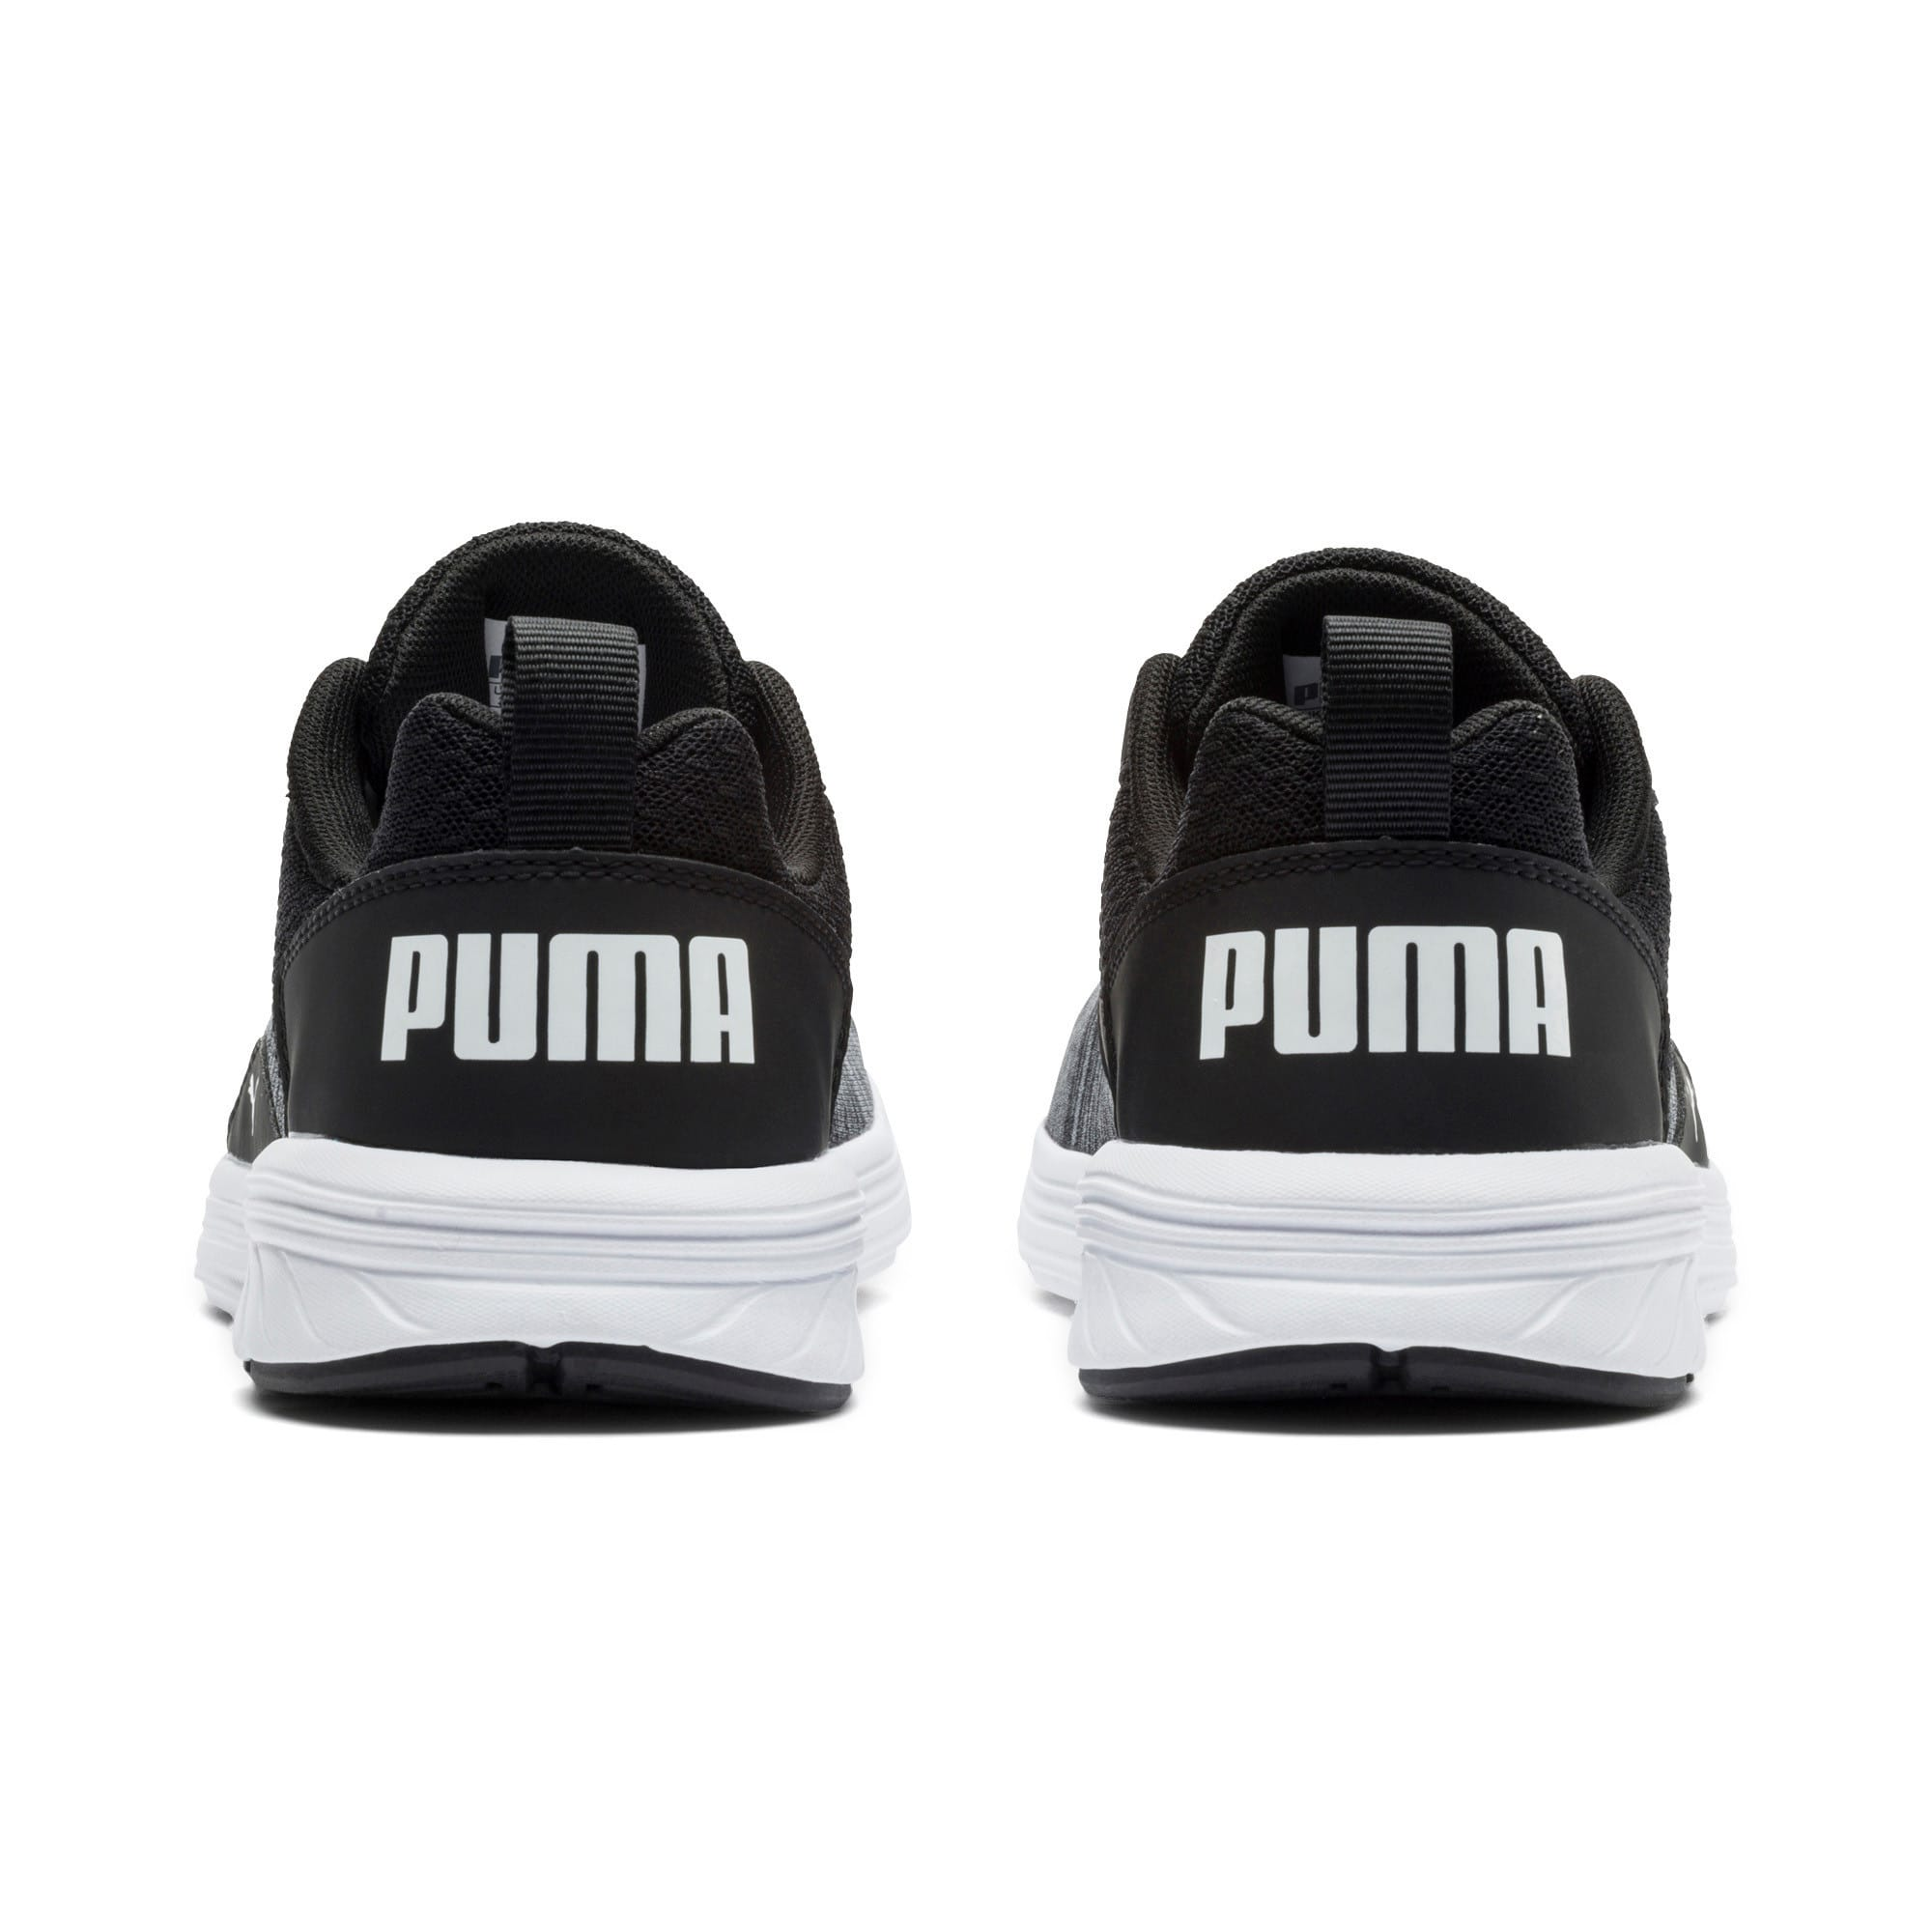 Thumbnail 4 of NRGY Comet Kids' Training Shoes, Puma White-Puma Black, medium-IND